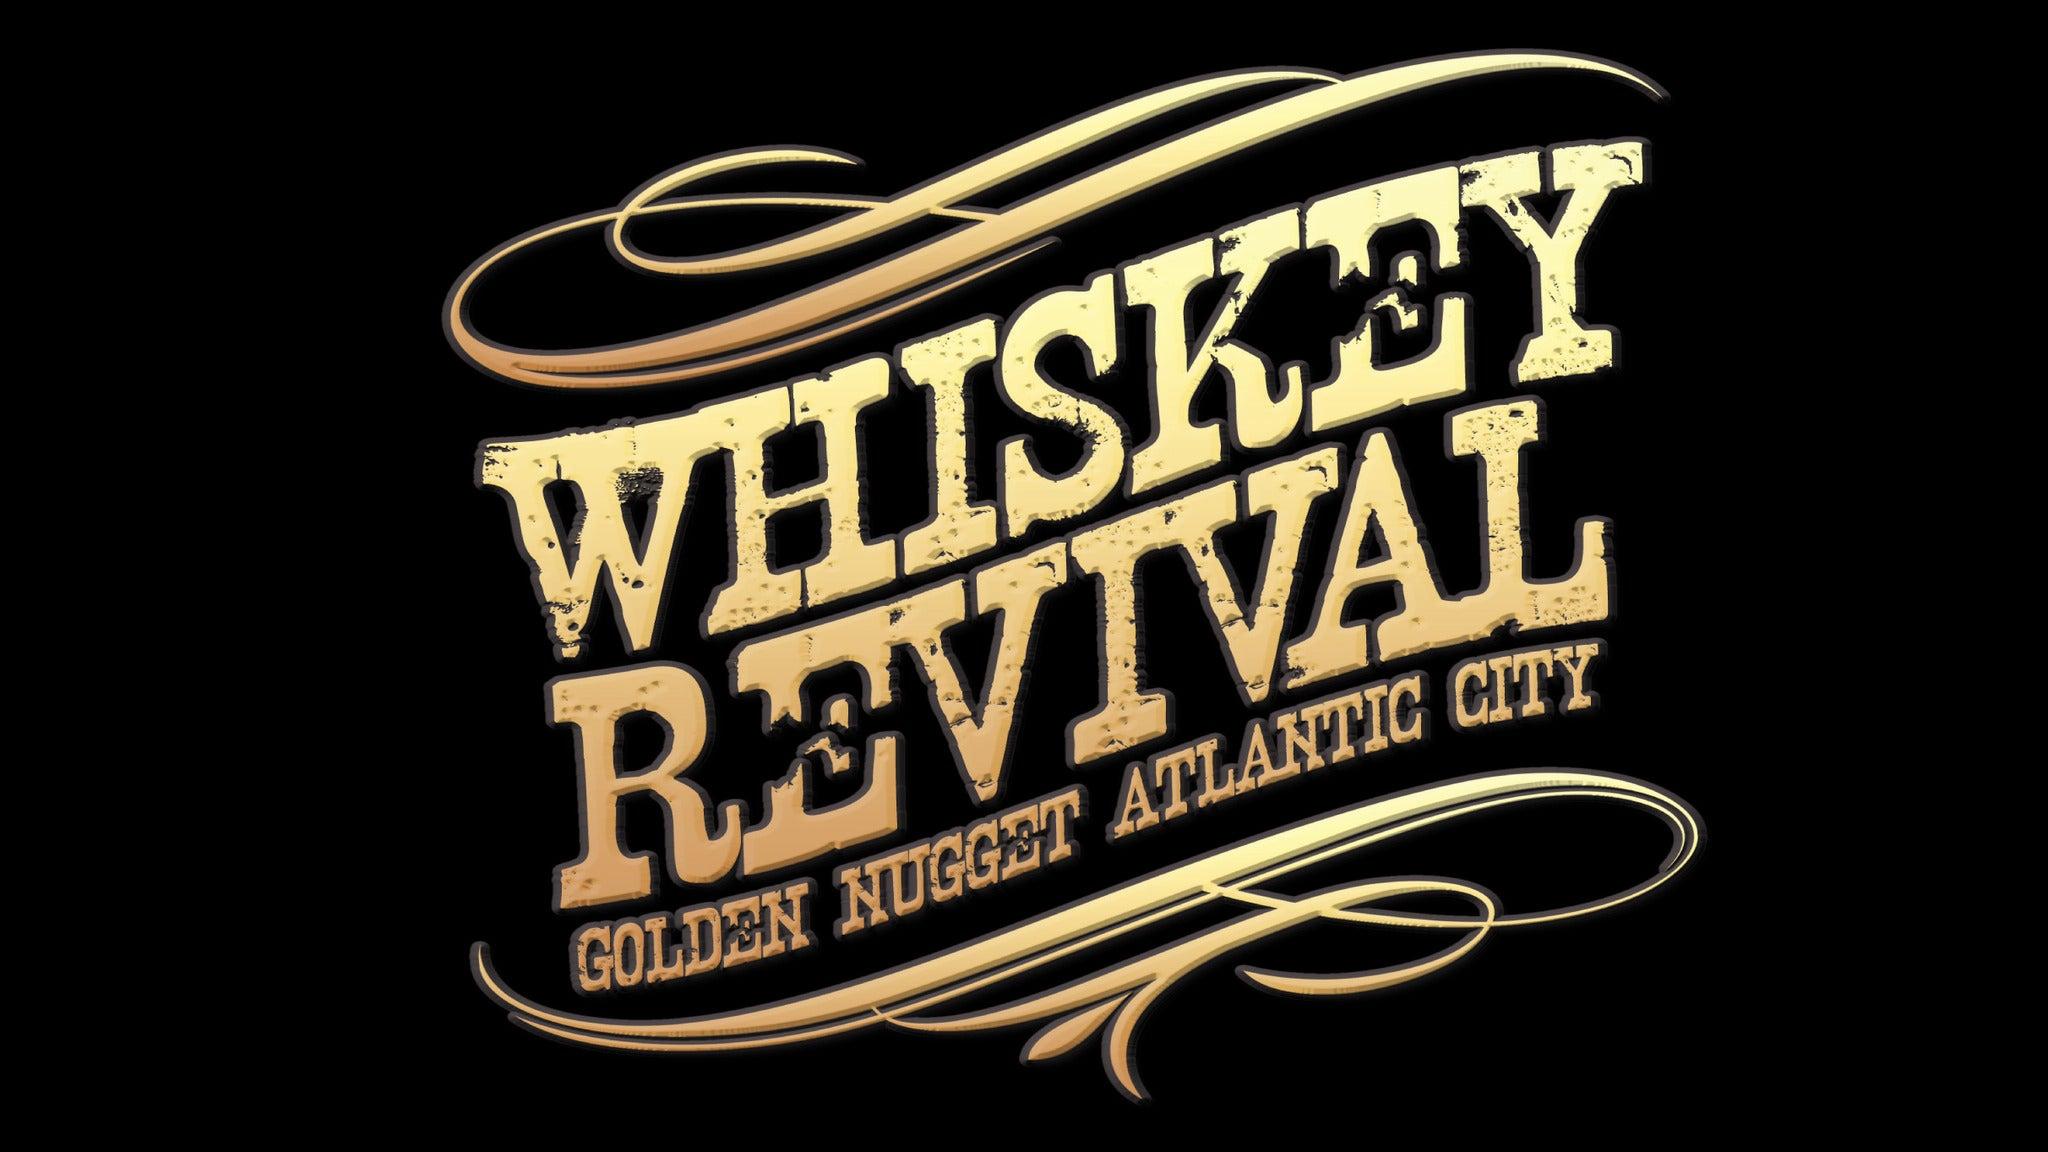 Golden Nugget Atlantic City Whiskey Revival